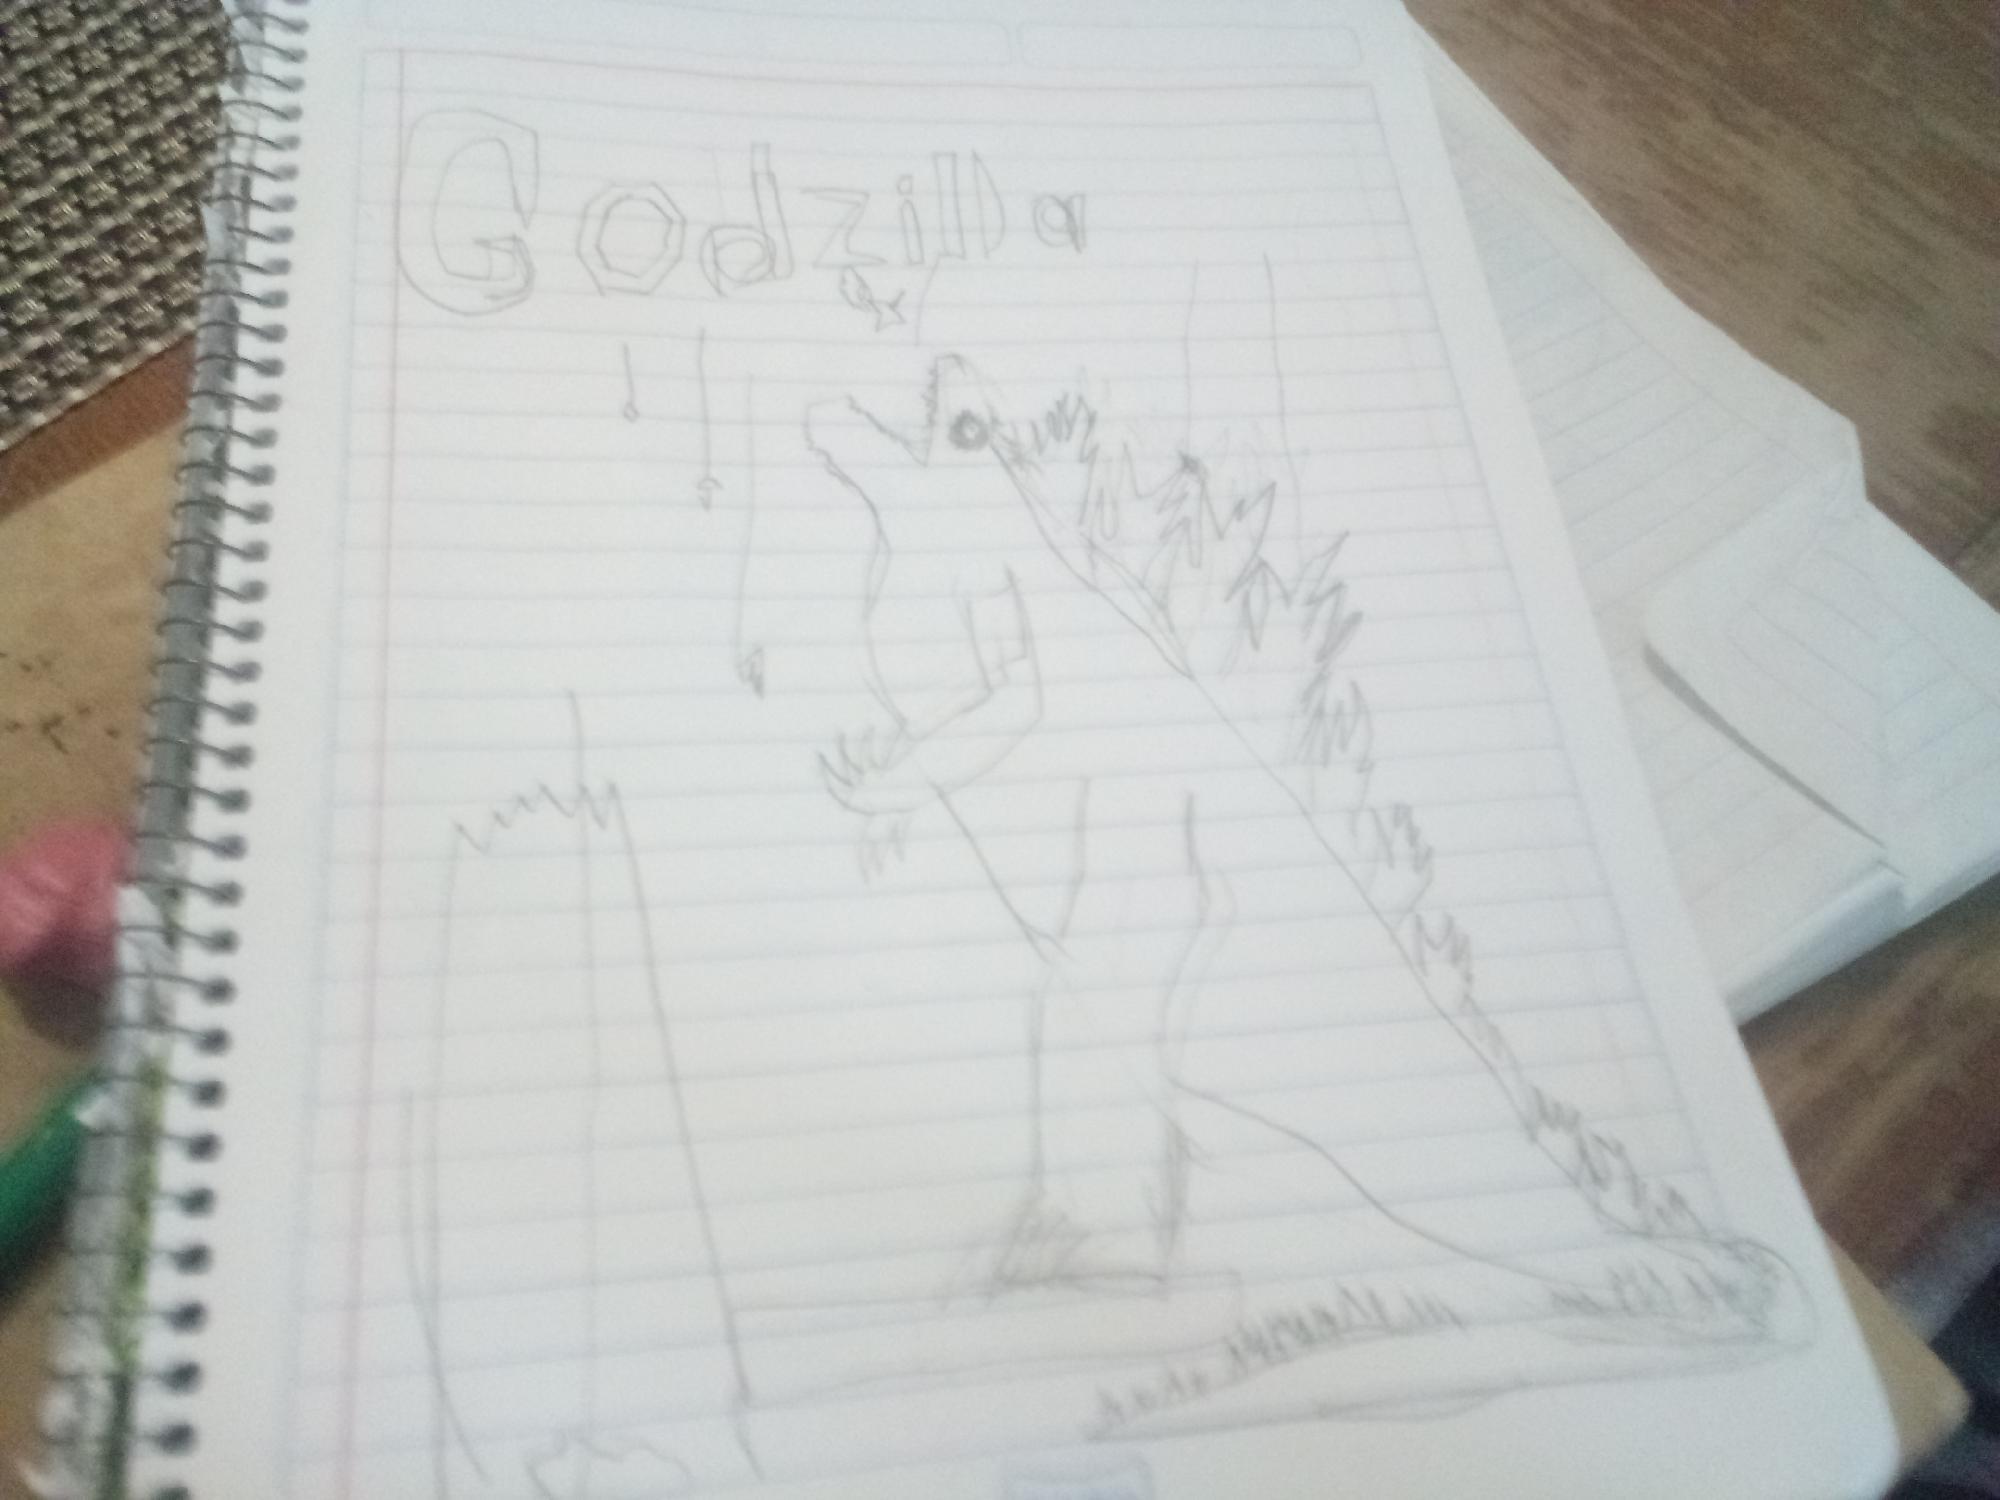 Godzilla inventado